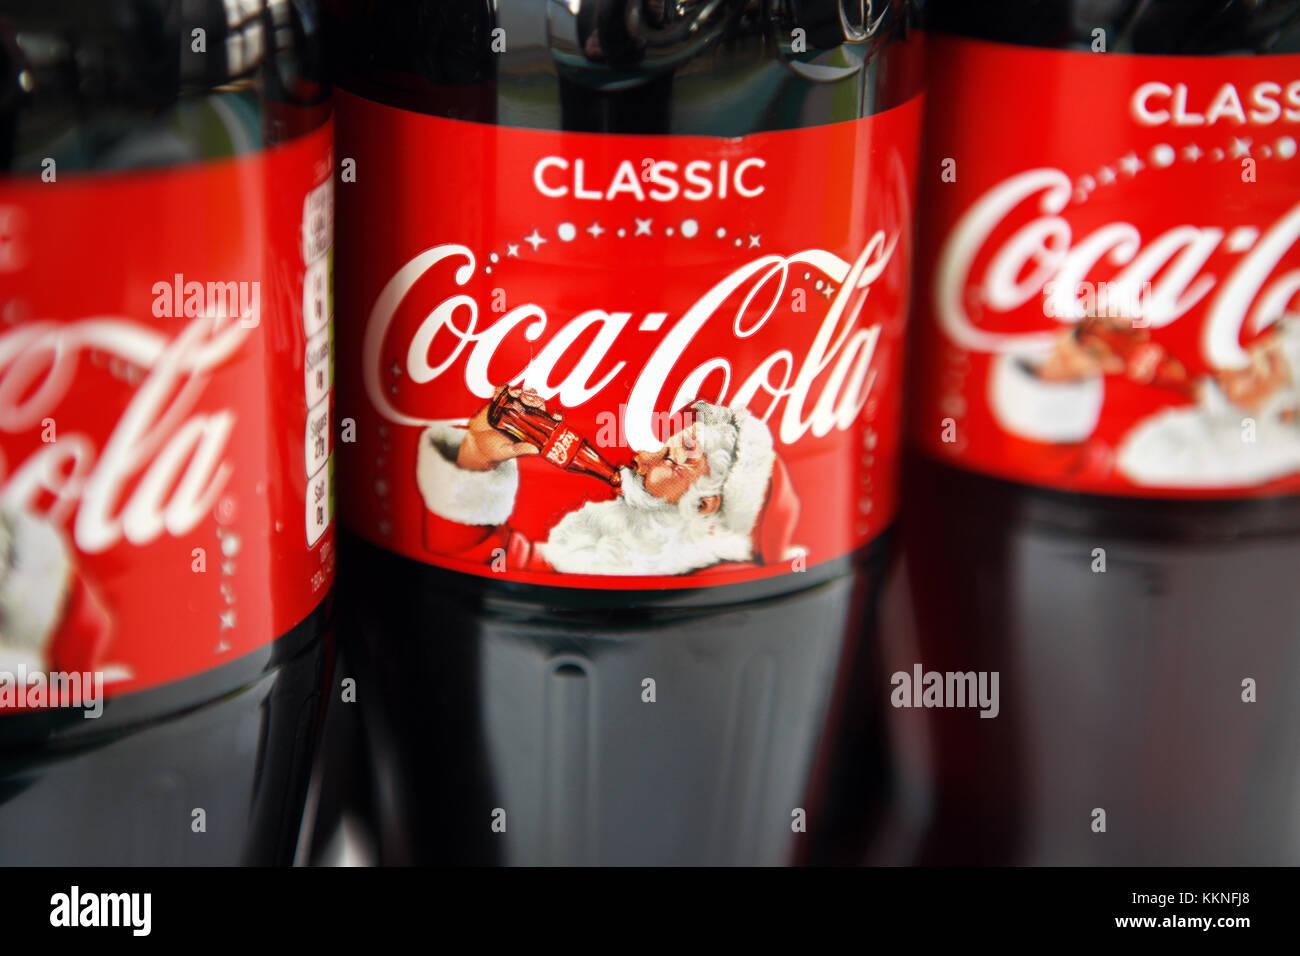 Coca Cola Christmas Bottle.Coca Cola Christmas Label Bottles Stock Photo 167045040 Alamy